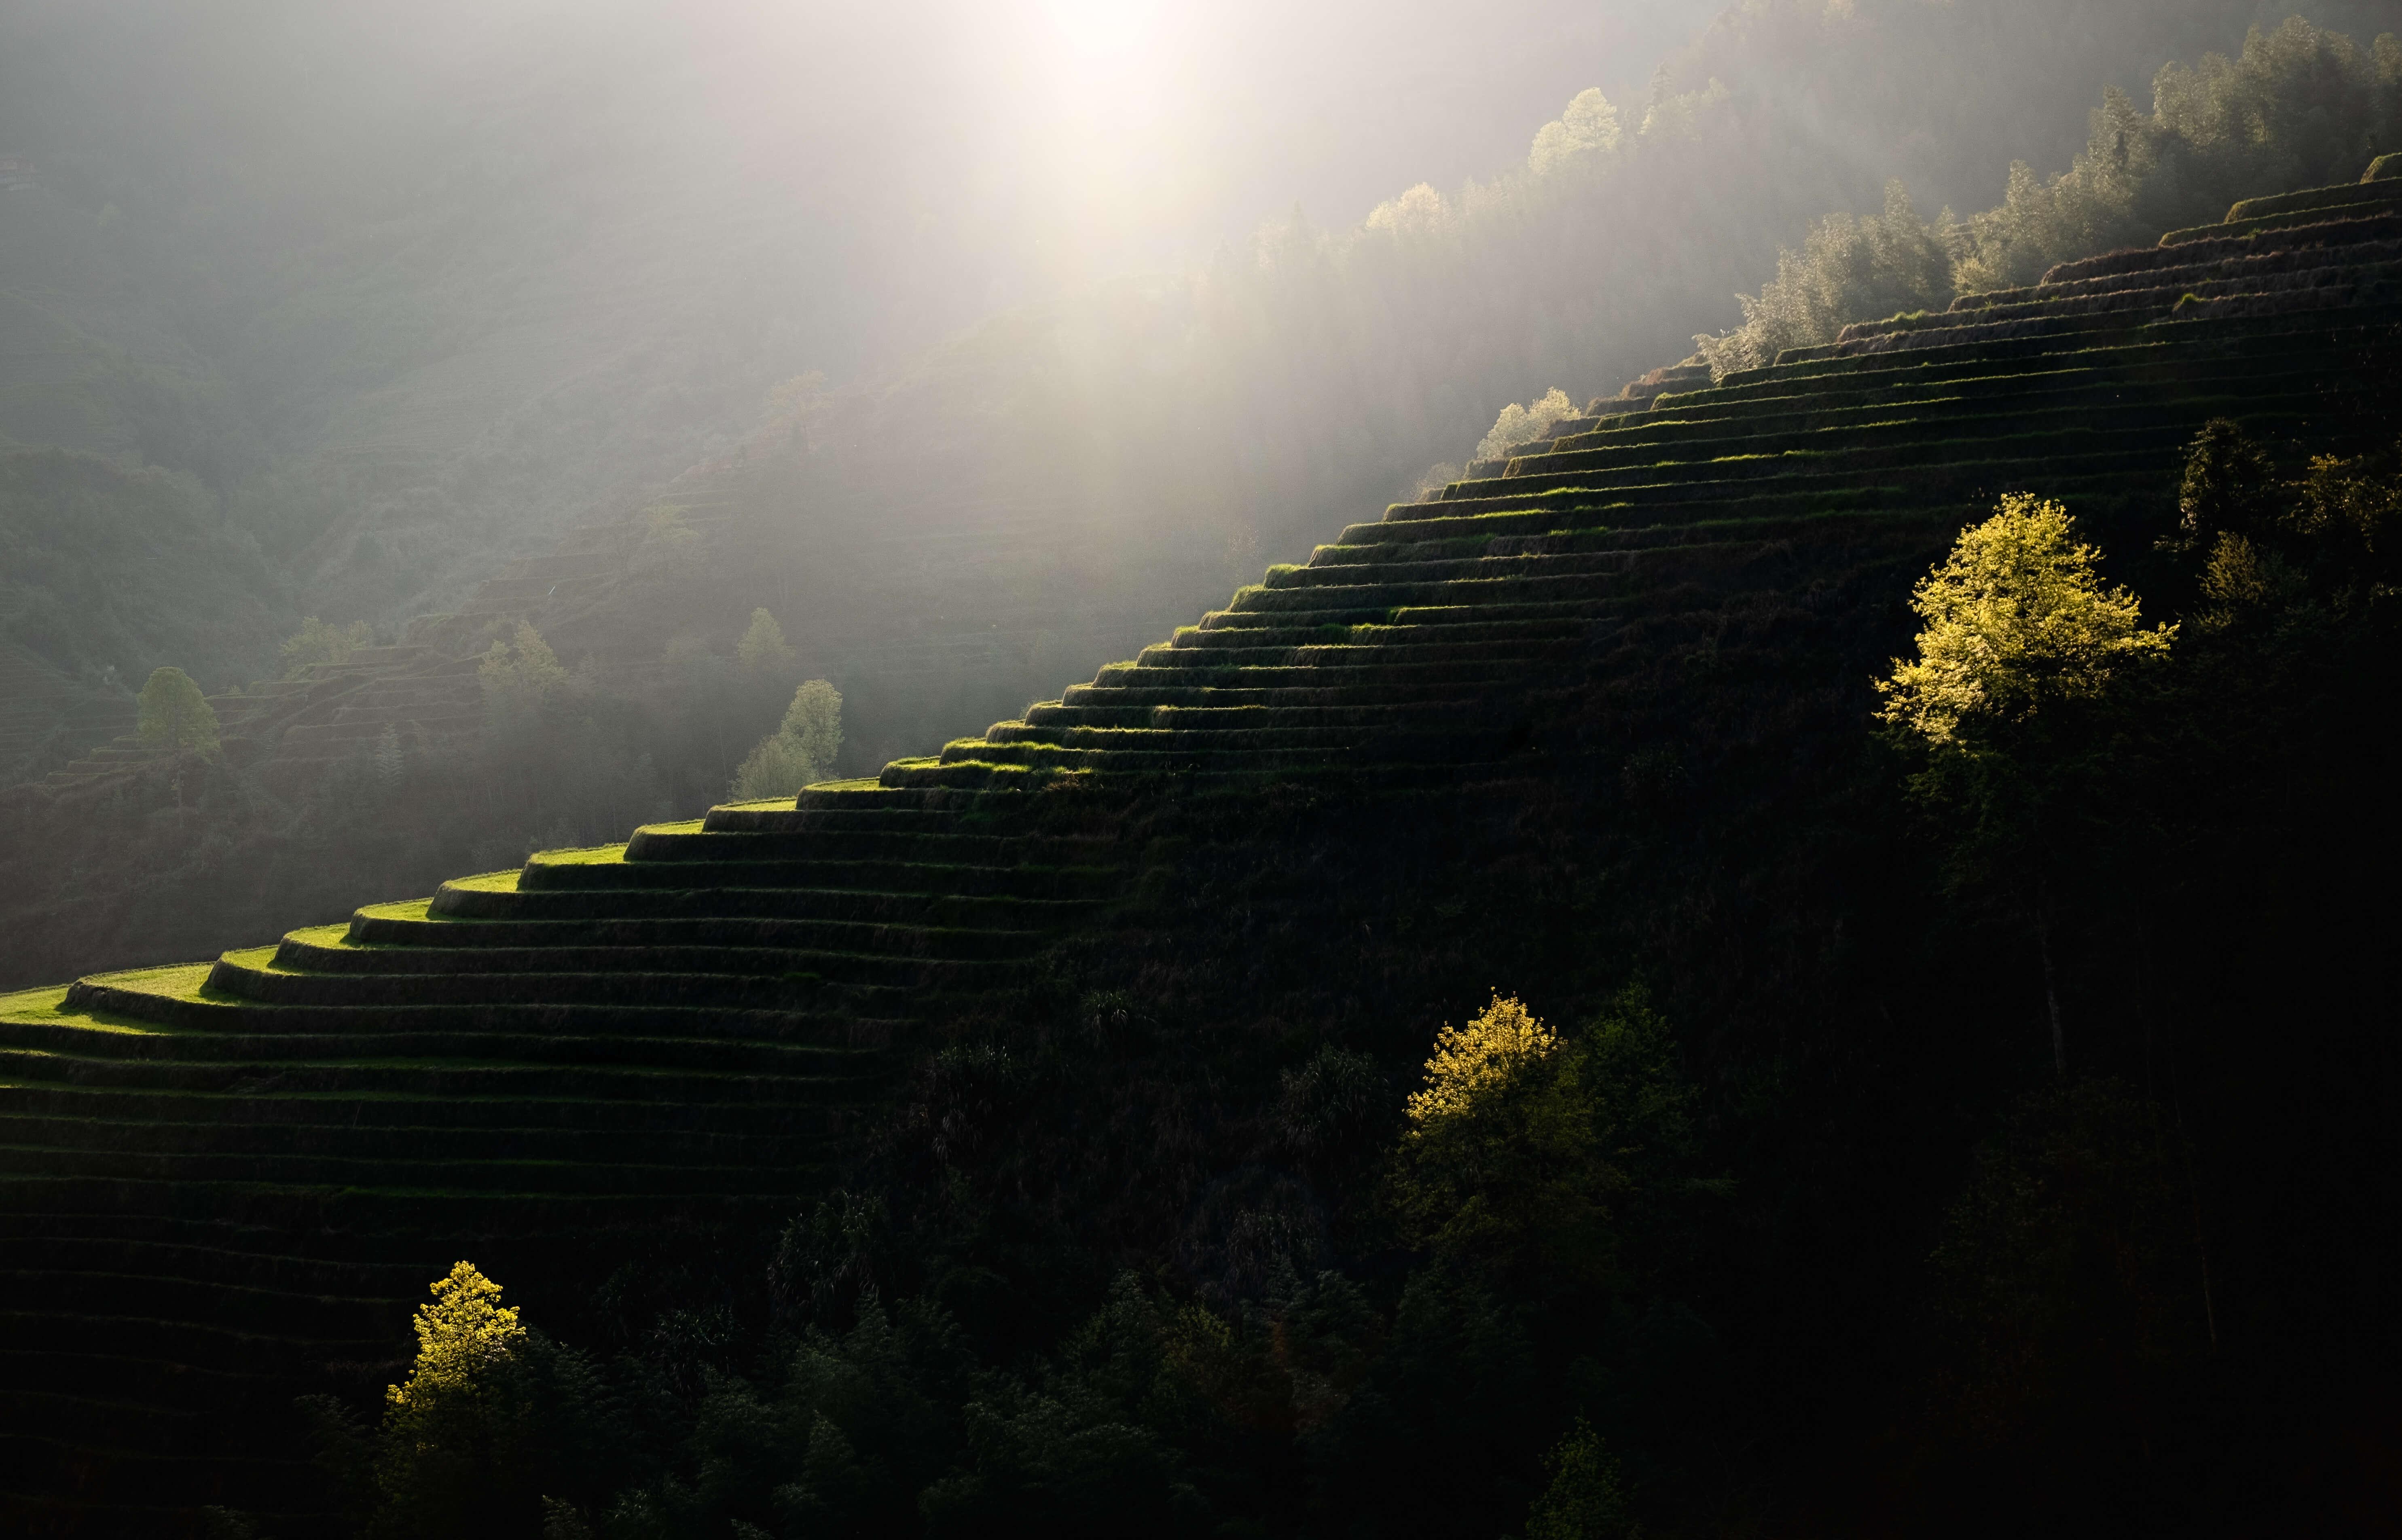 Longji rice terraces, longsheng, dazhai rice terraces, ping'an rice terraces, rice terraces in China, Guangxi, Travel in China, China travel, China trips, Photo Tour in China, China photo tours